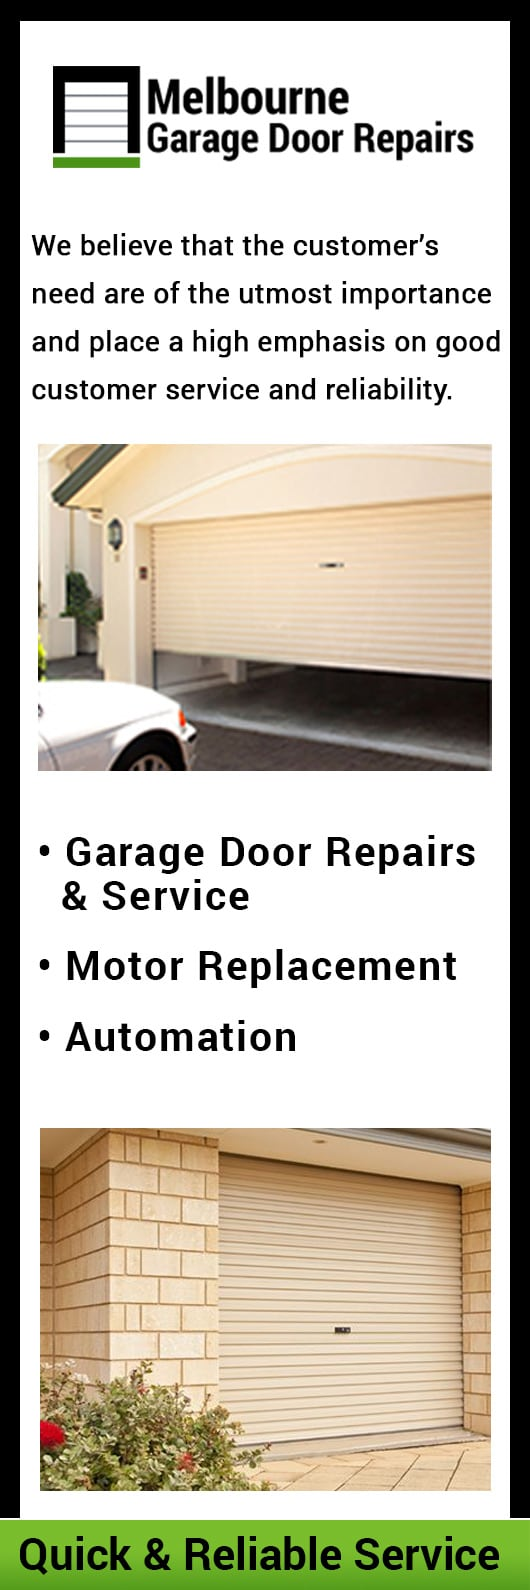 Melbourne Garage Door Repairs Garage Doors Fittings Brighton East